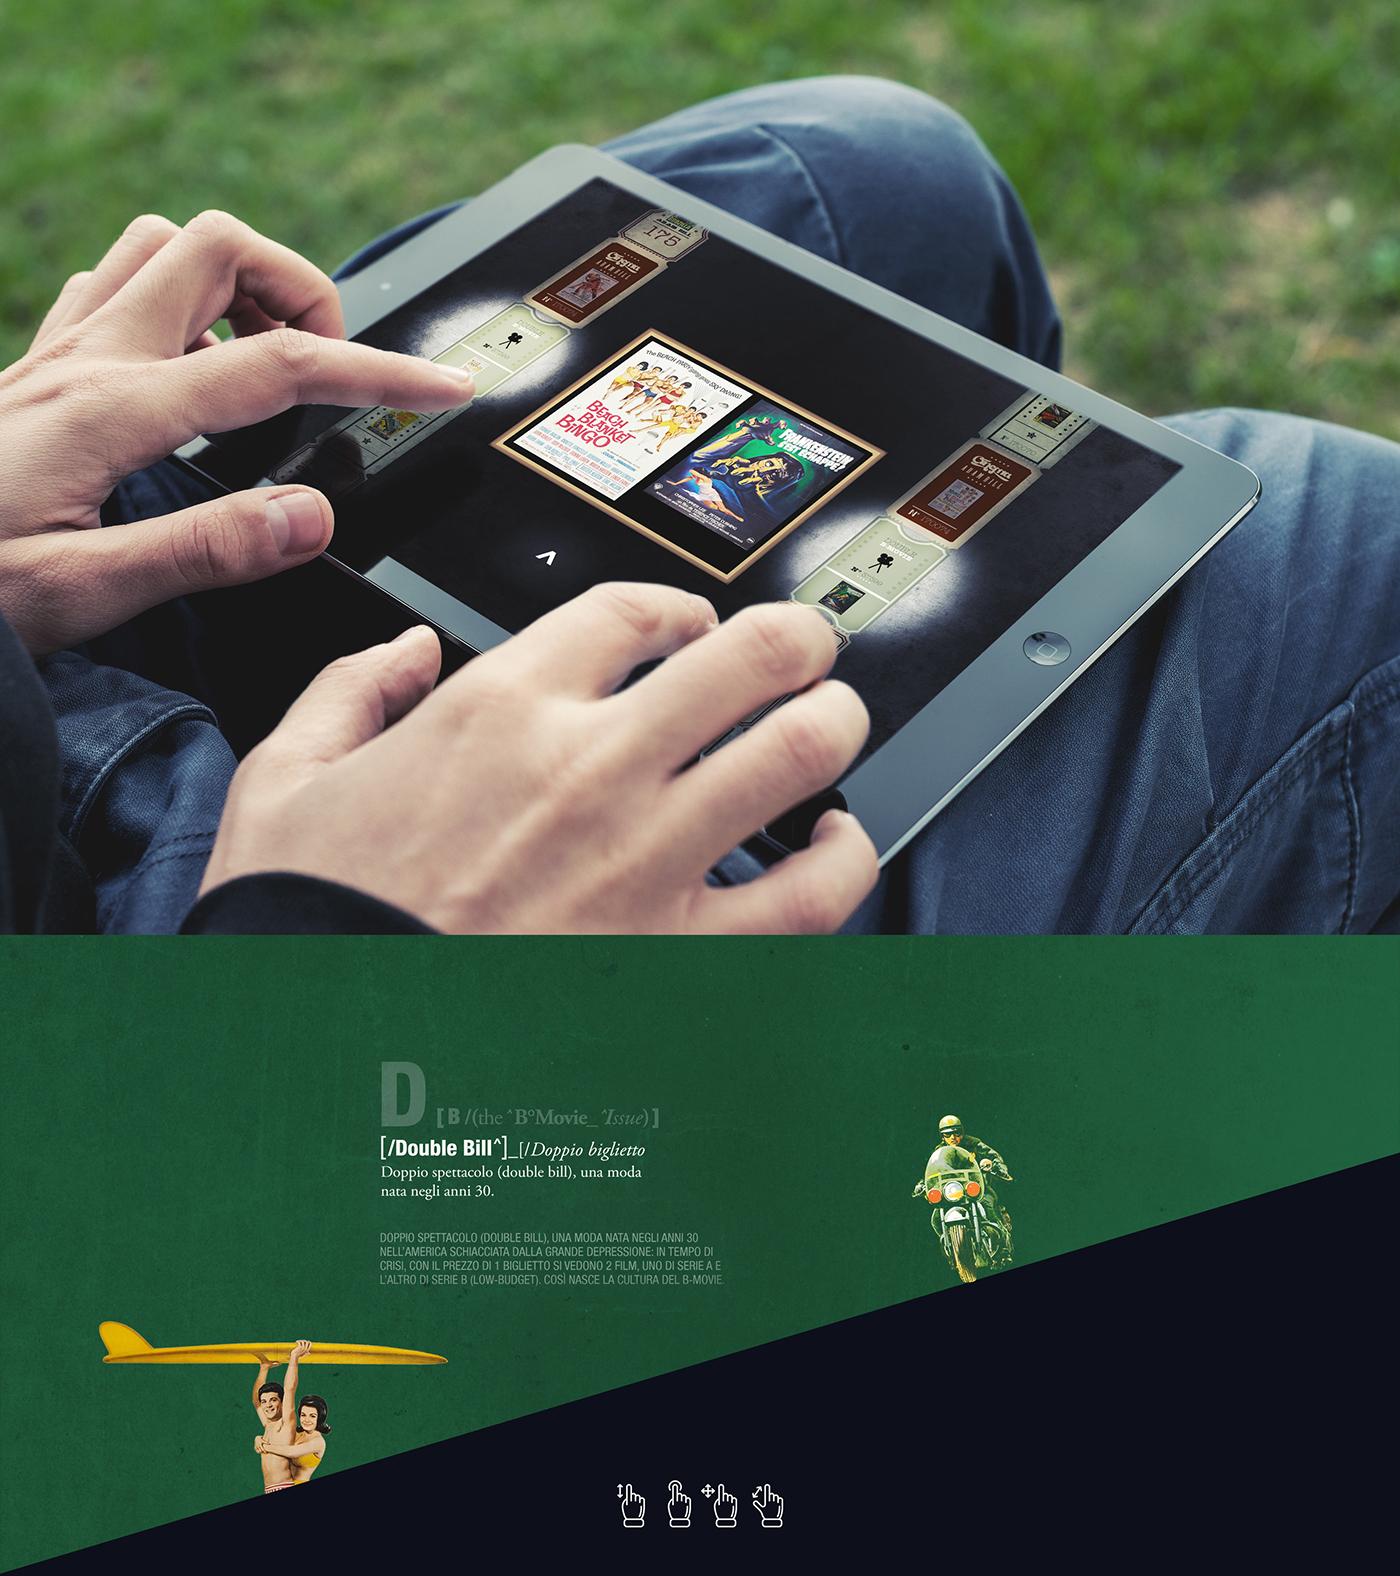 Adam Alphabet Digital Art magazine fefe project ied roma Visual Creative Studio